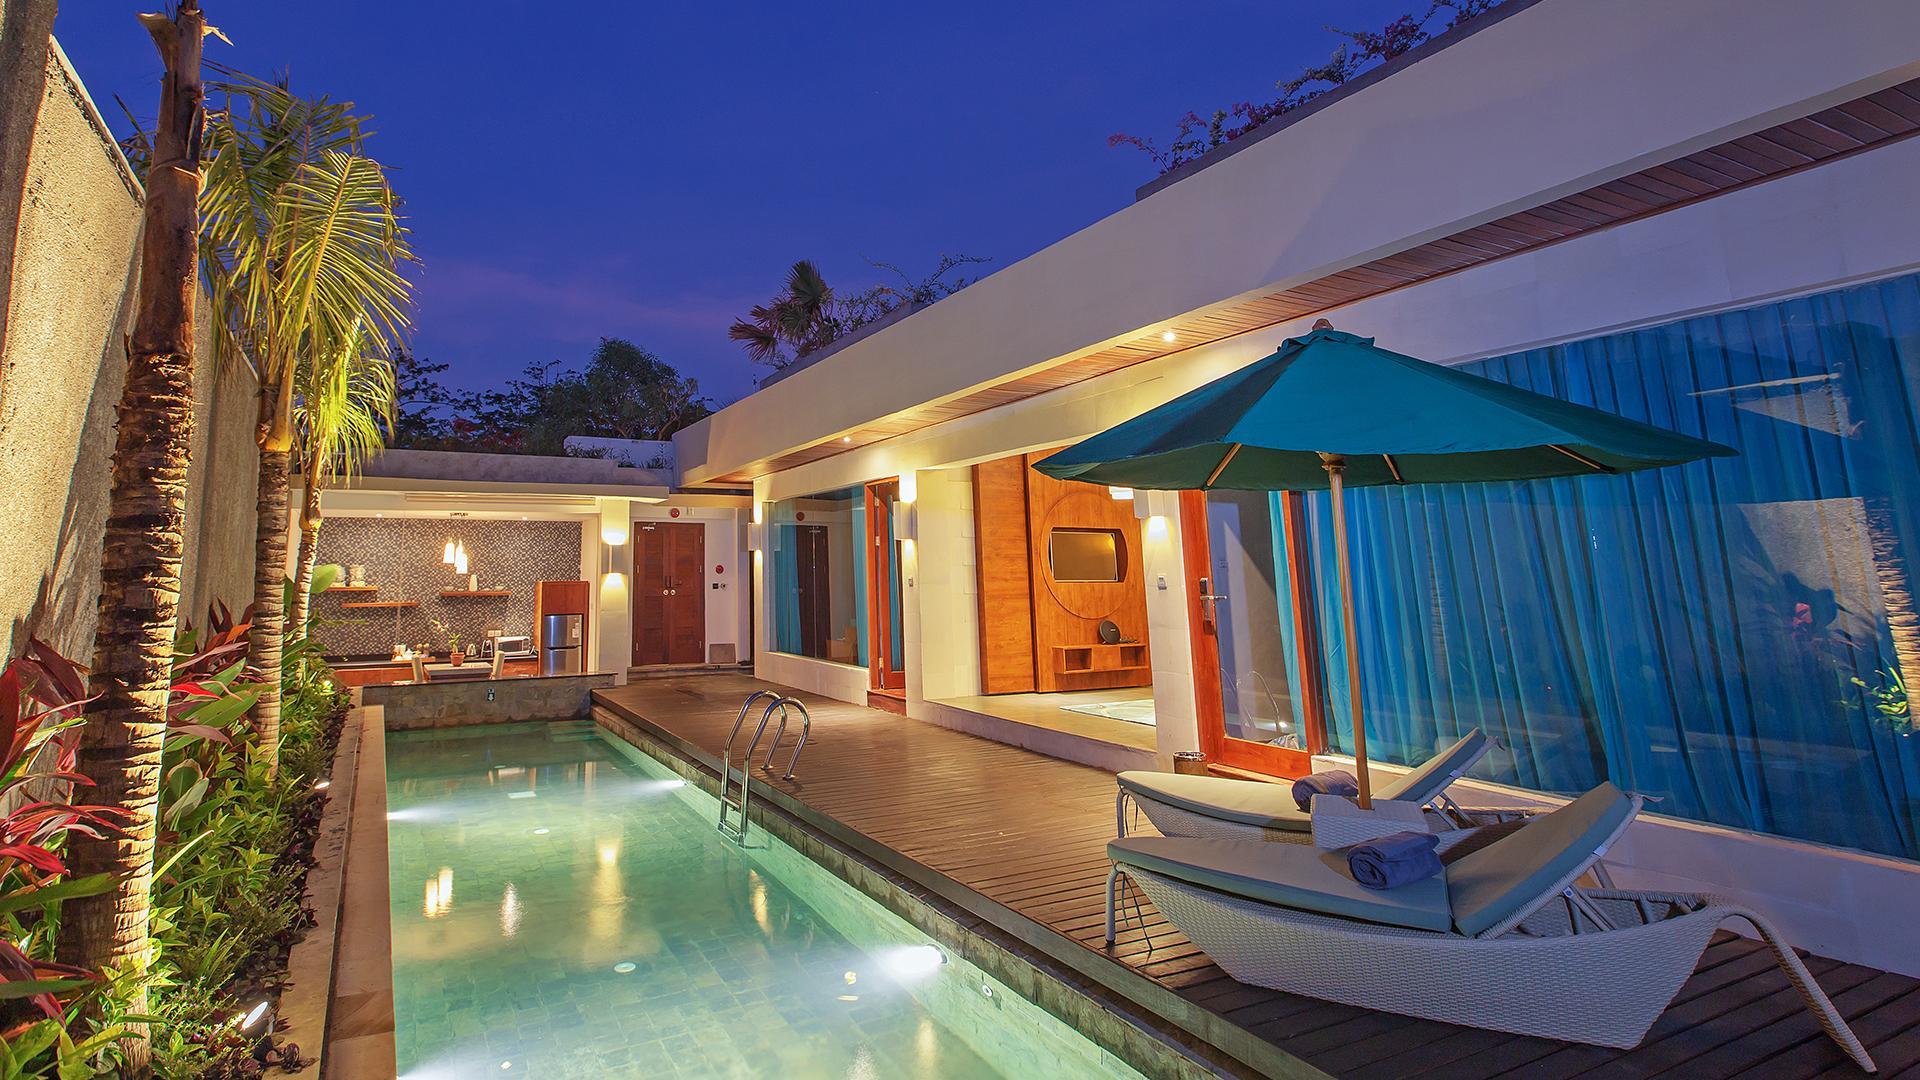 Sage Two-Bedroom Pool Villa image 1 at The Leaf Jimbaran by Kabupaten Badung, Bali, Indonesia